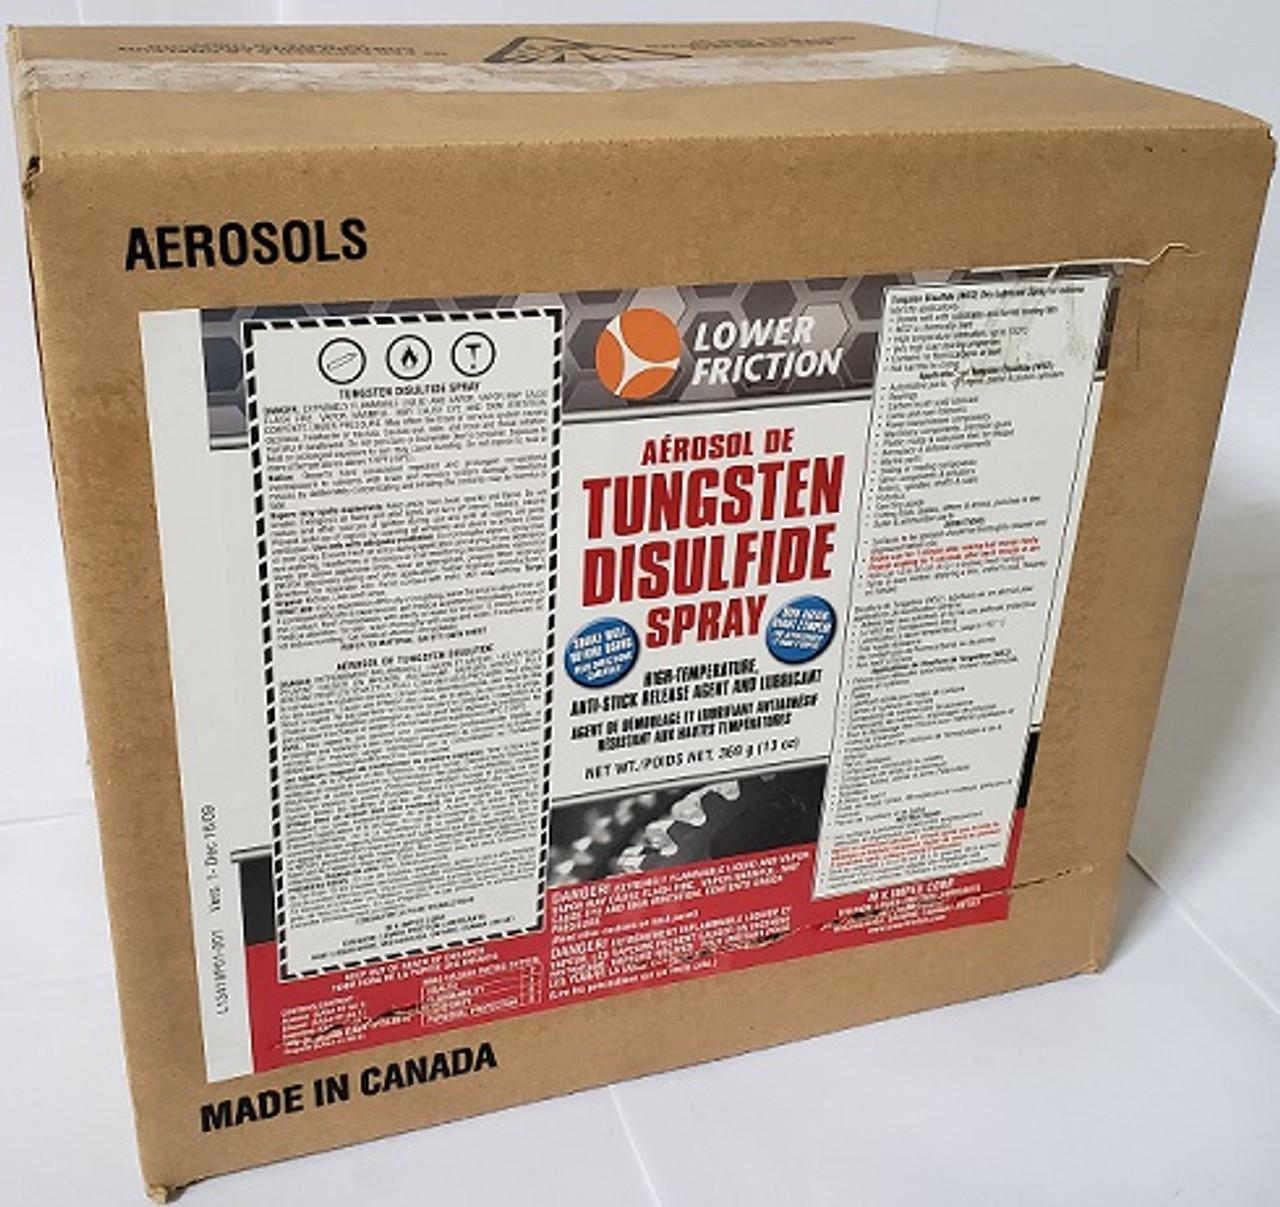 Tungsten Disulfide (WS2) Aerosol Spray, 13 Oz/370 gram Can